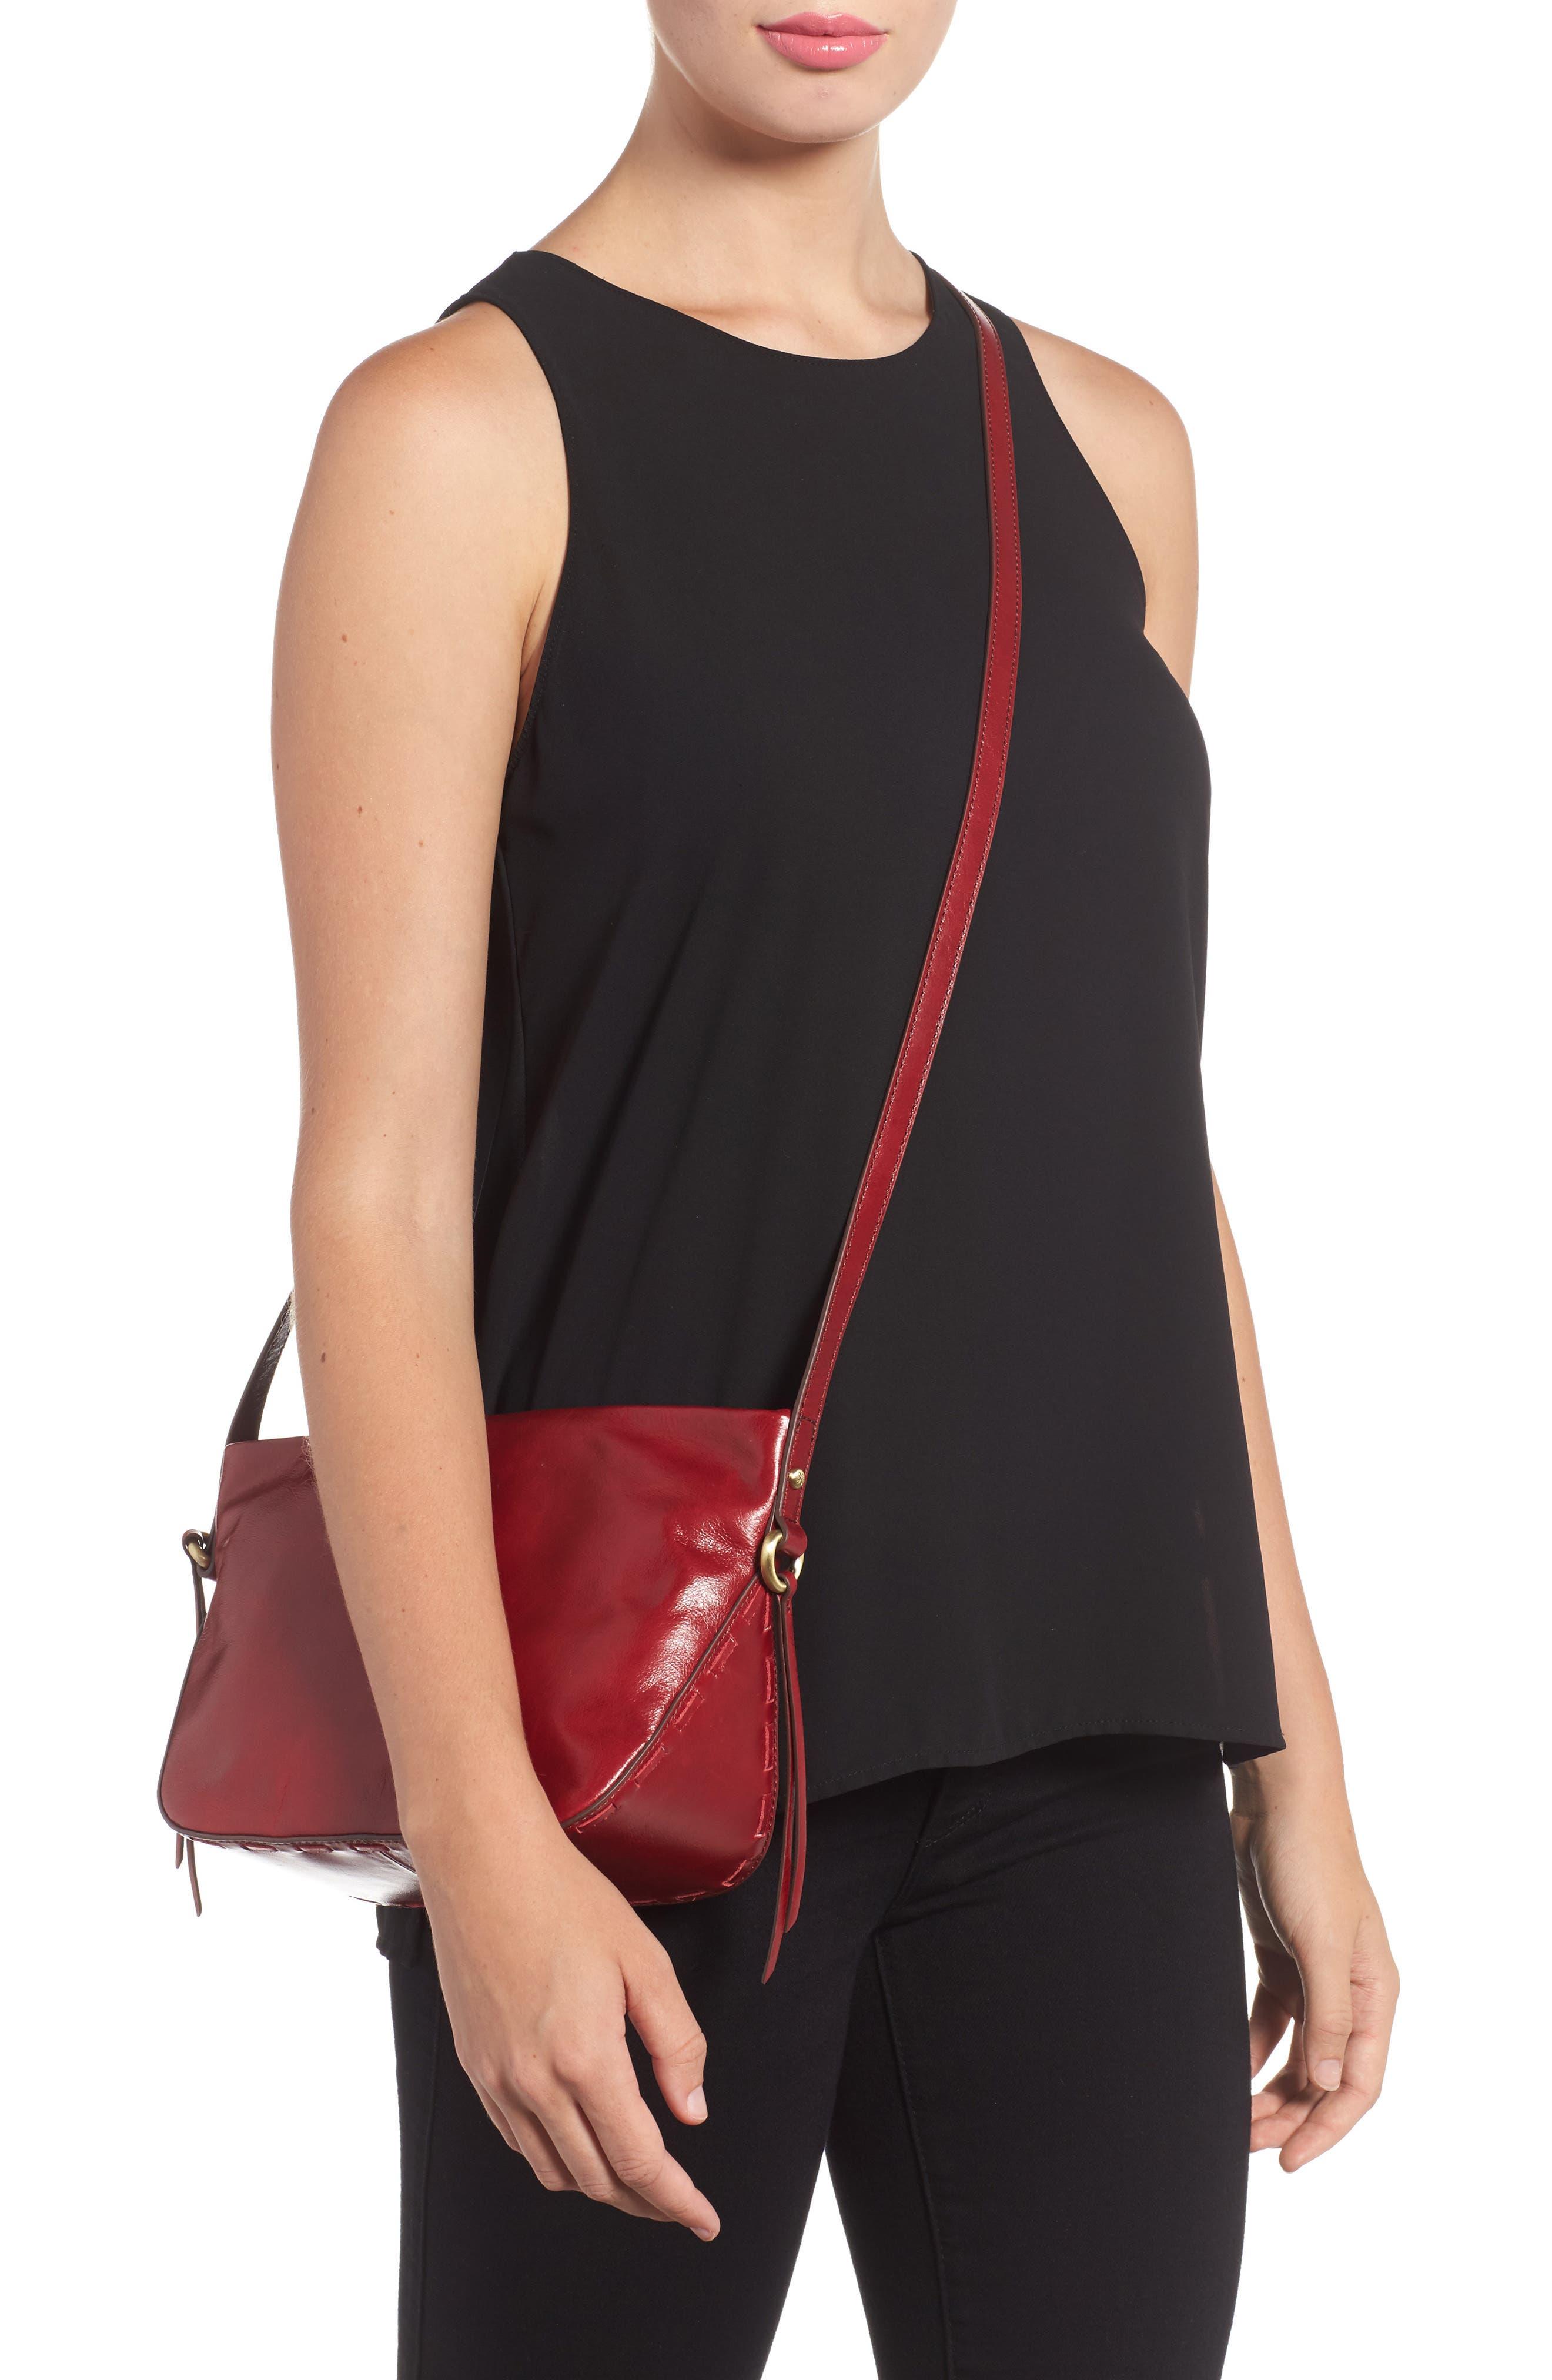 Muse Calfskin Leather Crossbody Bag,                             Alternate thumbnail 2, color,                             Cardinal